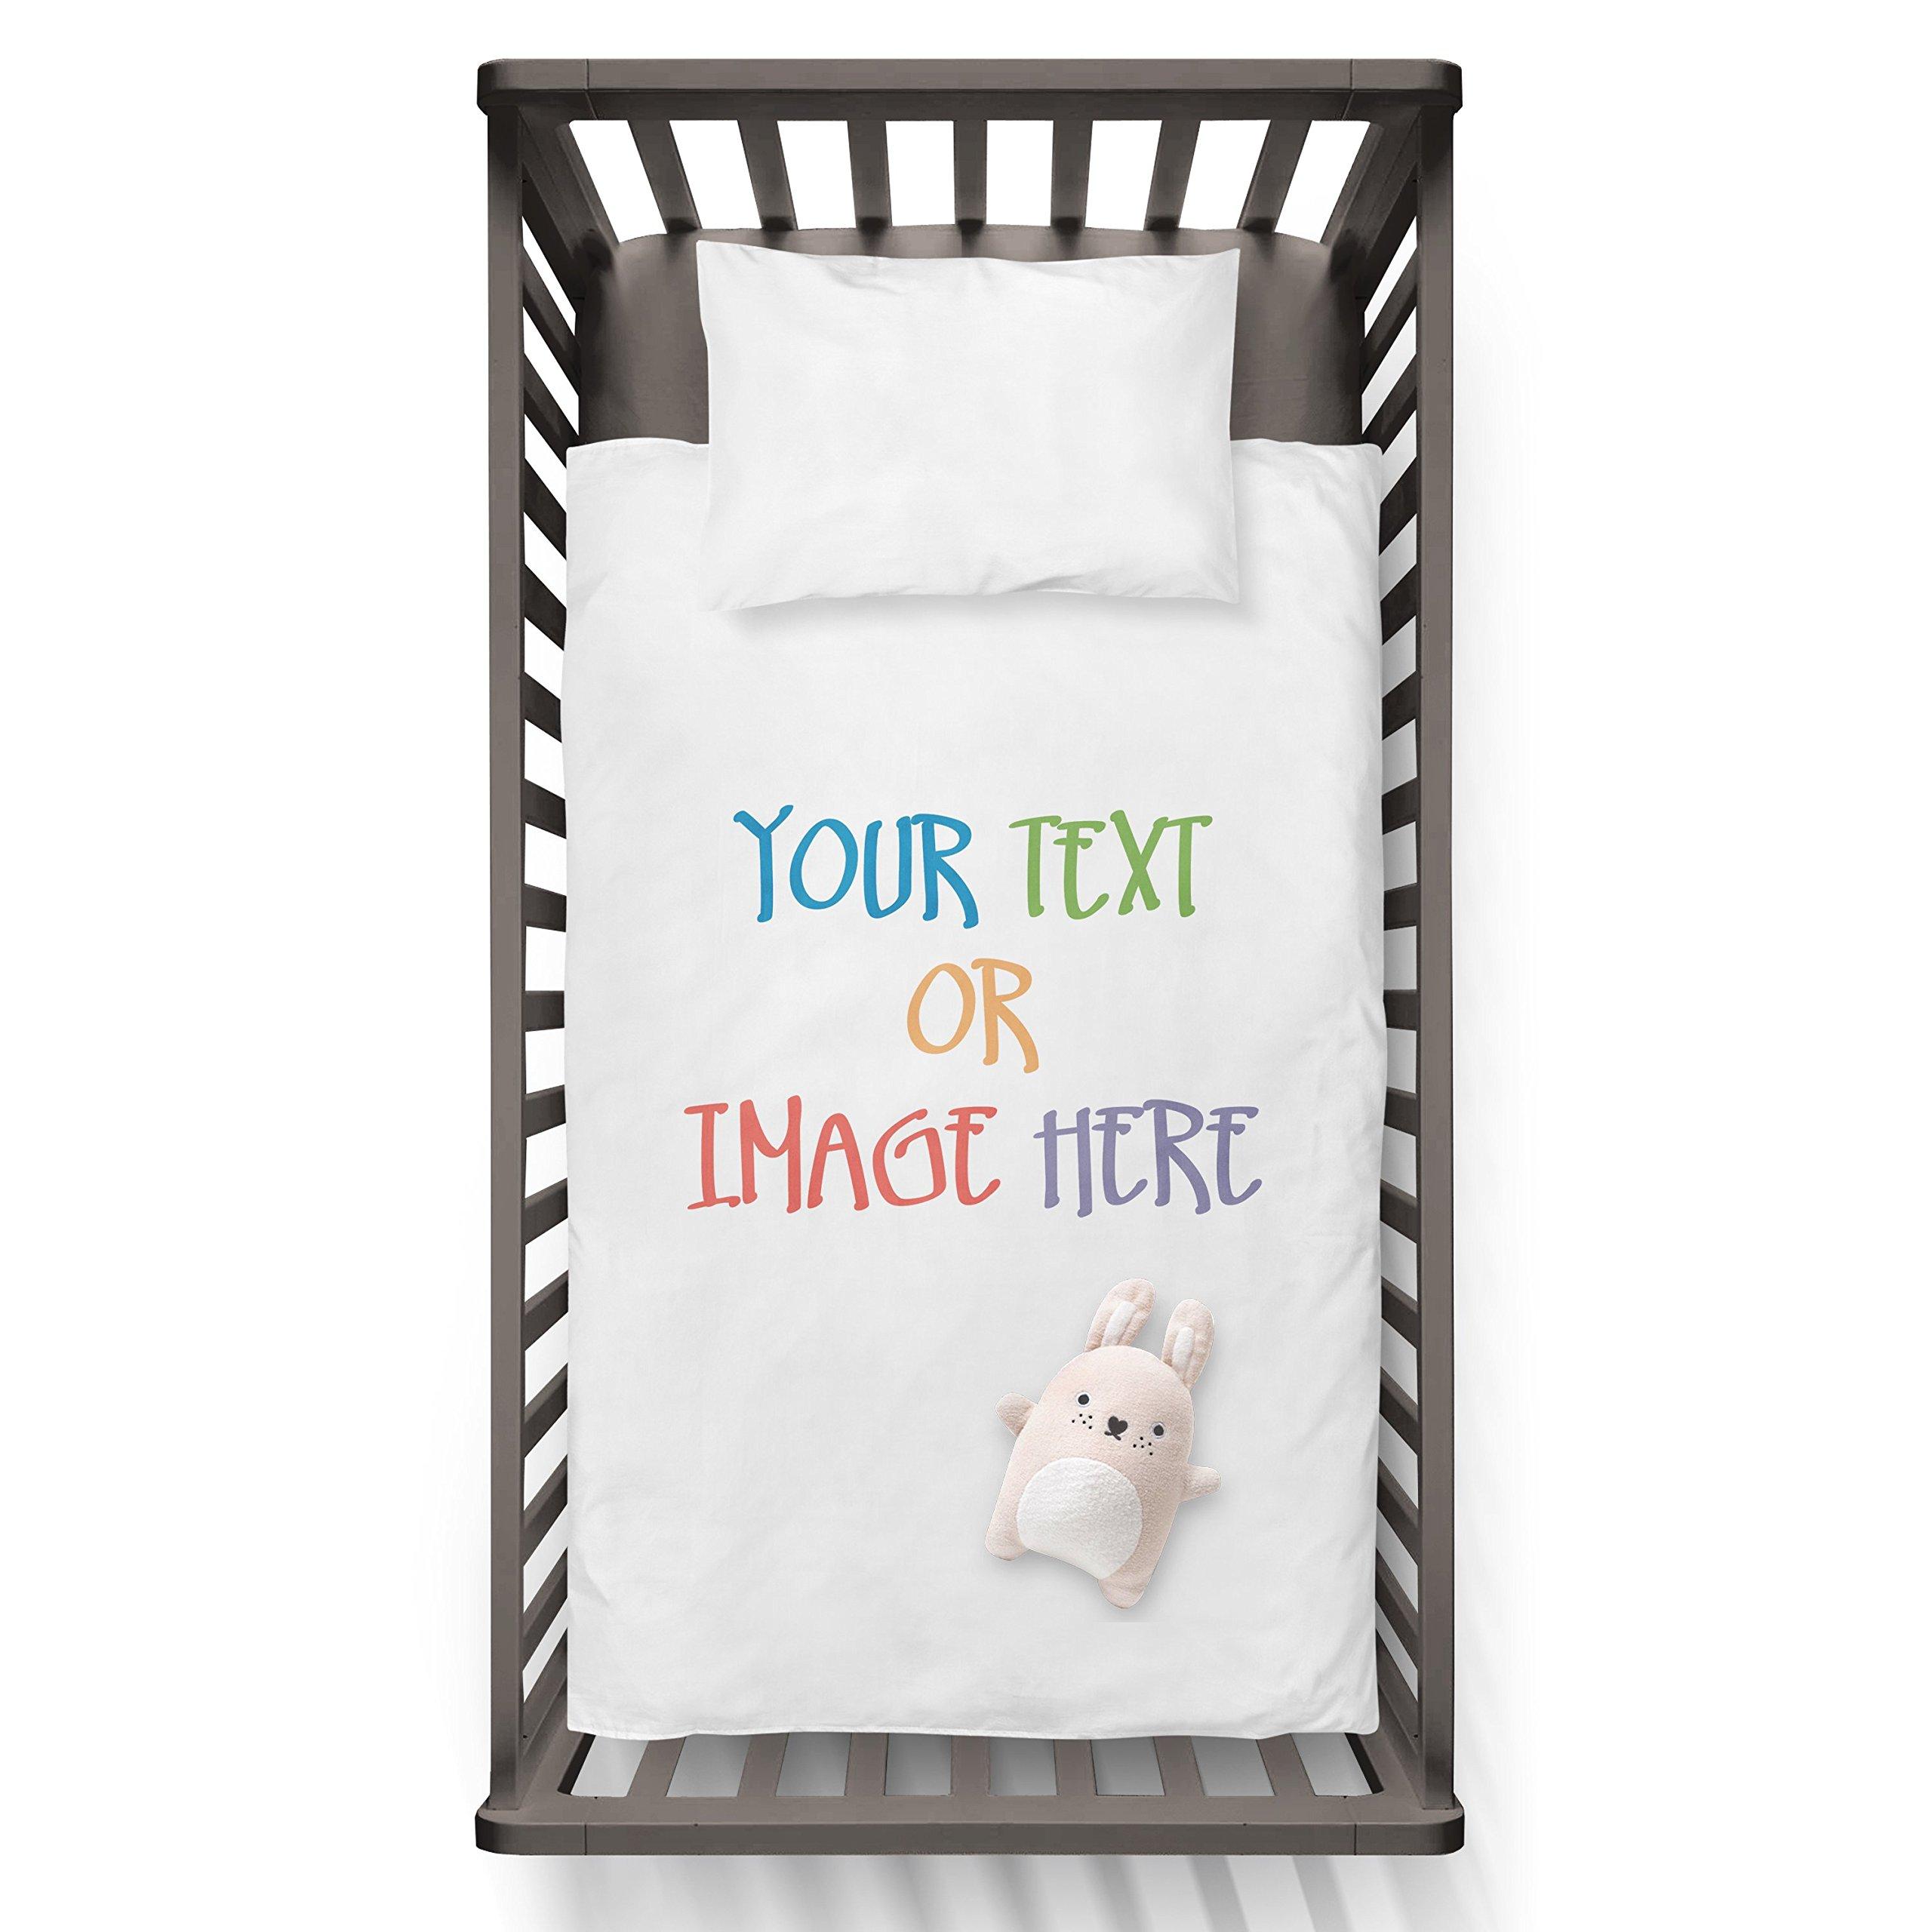 Personalised duvet Your text or image here Funny Humor Hip Baby Duvet /Pillow set,Toddler Duvet,Oeko-Tex,Personalized duvet and pillow,Oraganic,gift